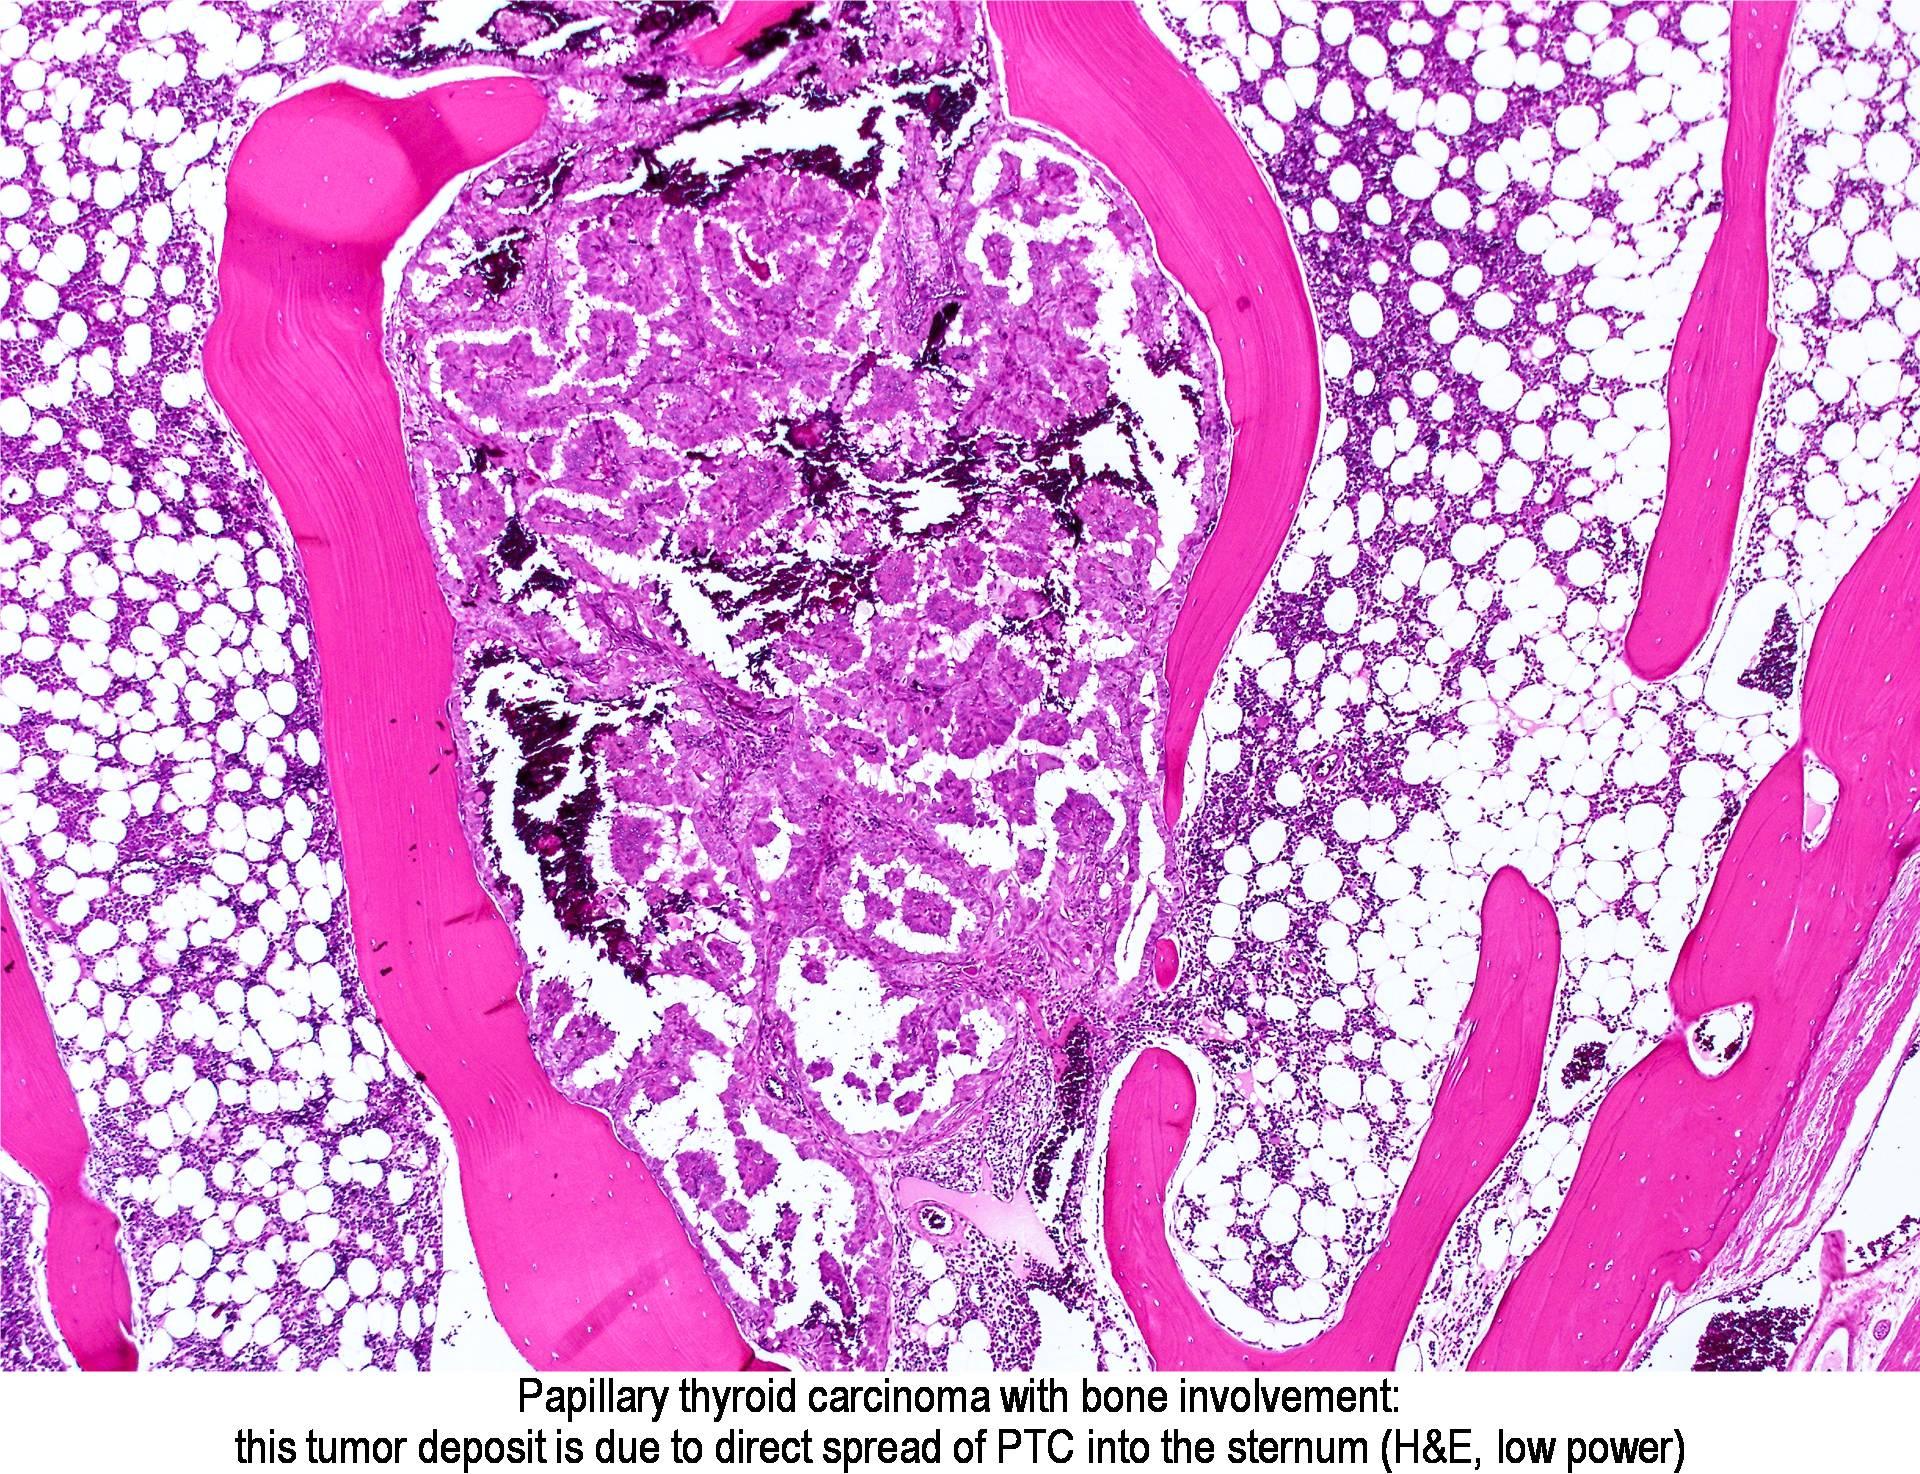 papillary thyroid cancer in bones